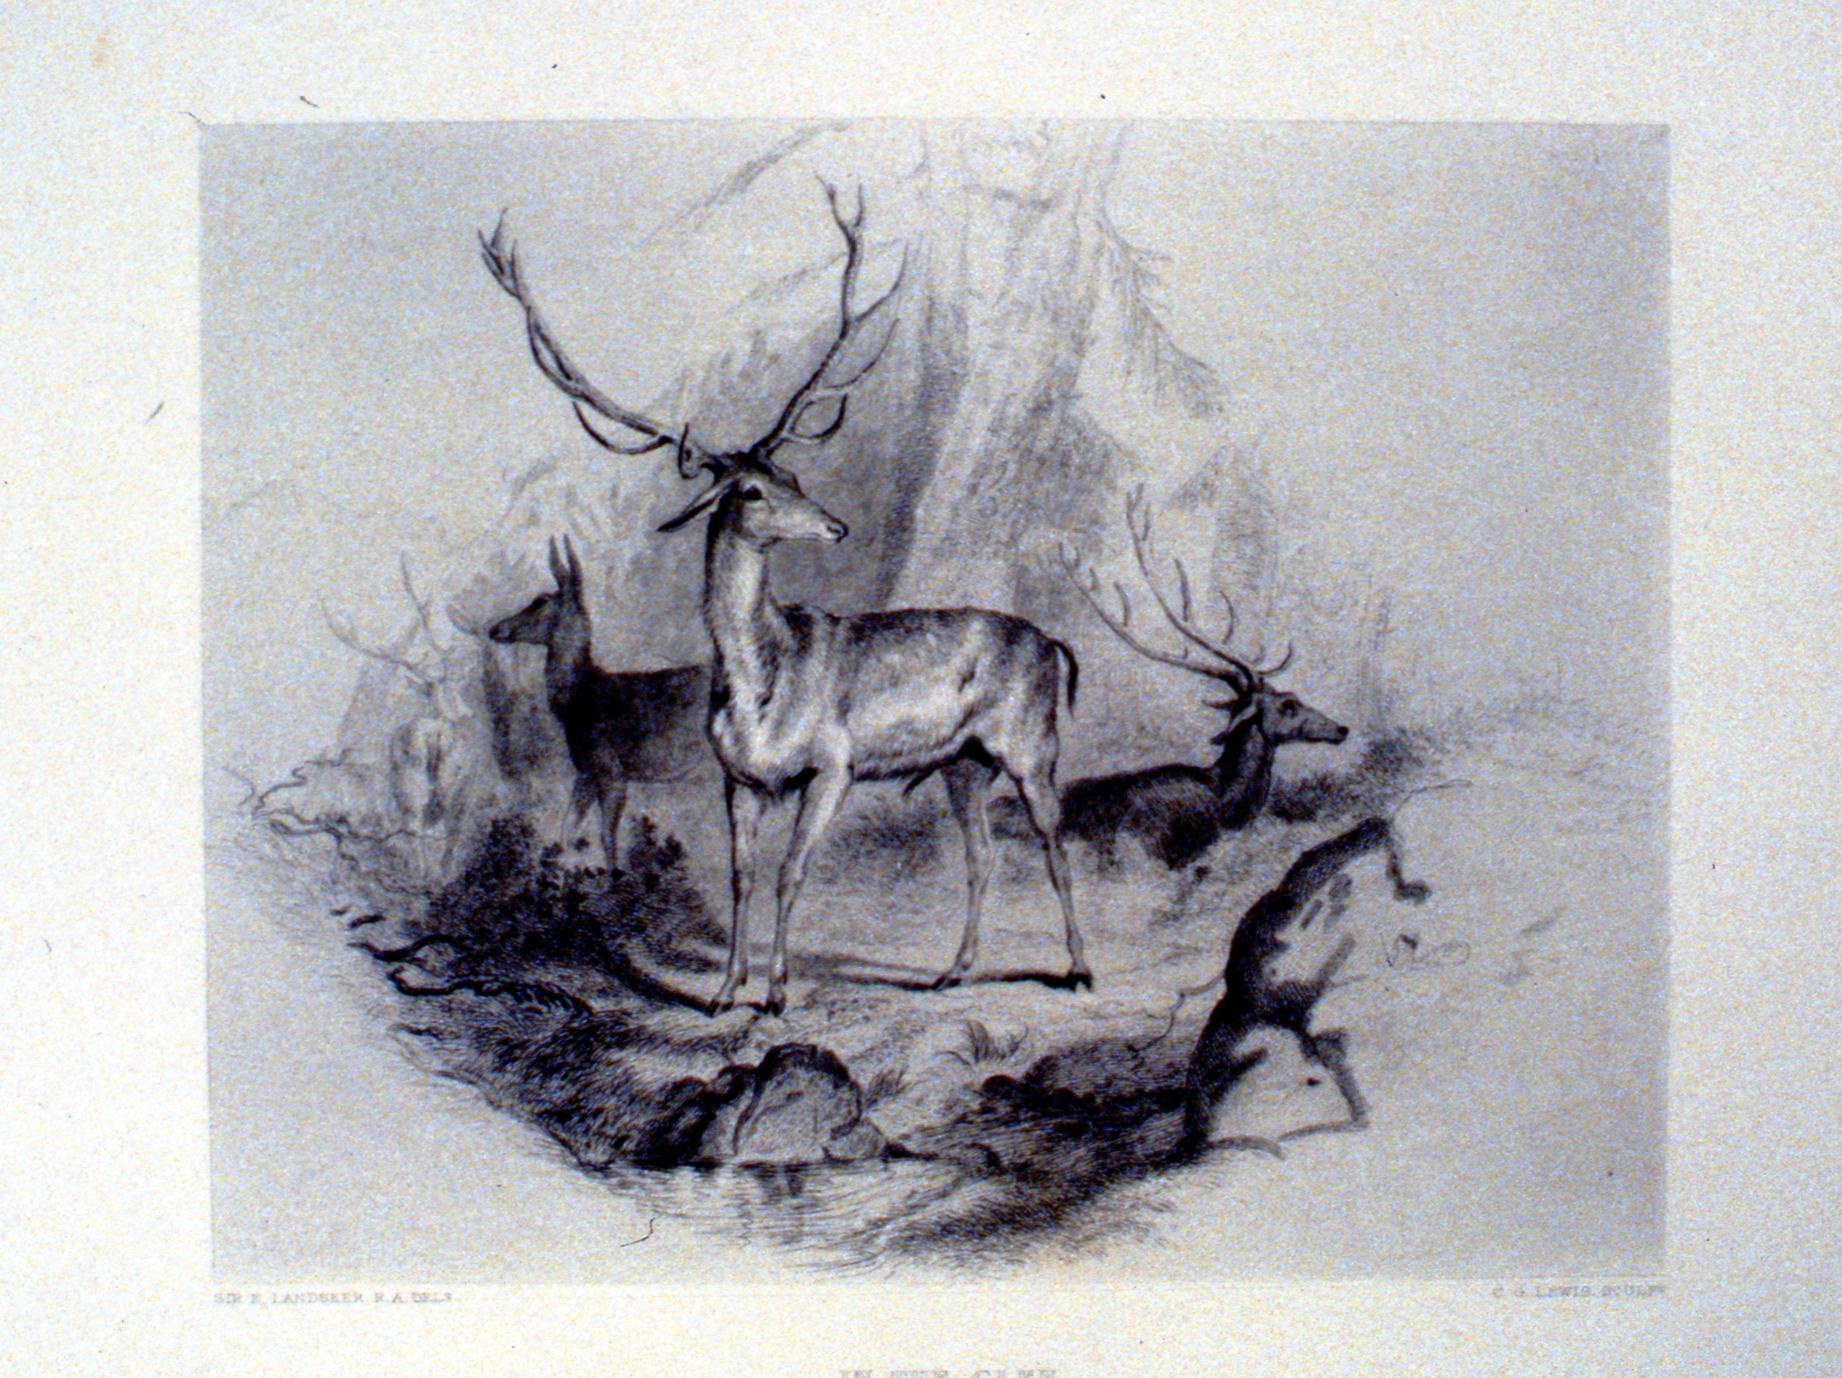 In the Glen , c. late 19th Century, Charles G. Lewis, steel engraving, 17.3 cm x 22 cm, 1996.08.35, gift of Yvonne Adams